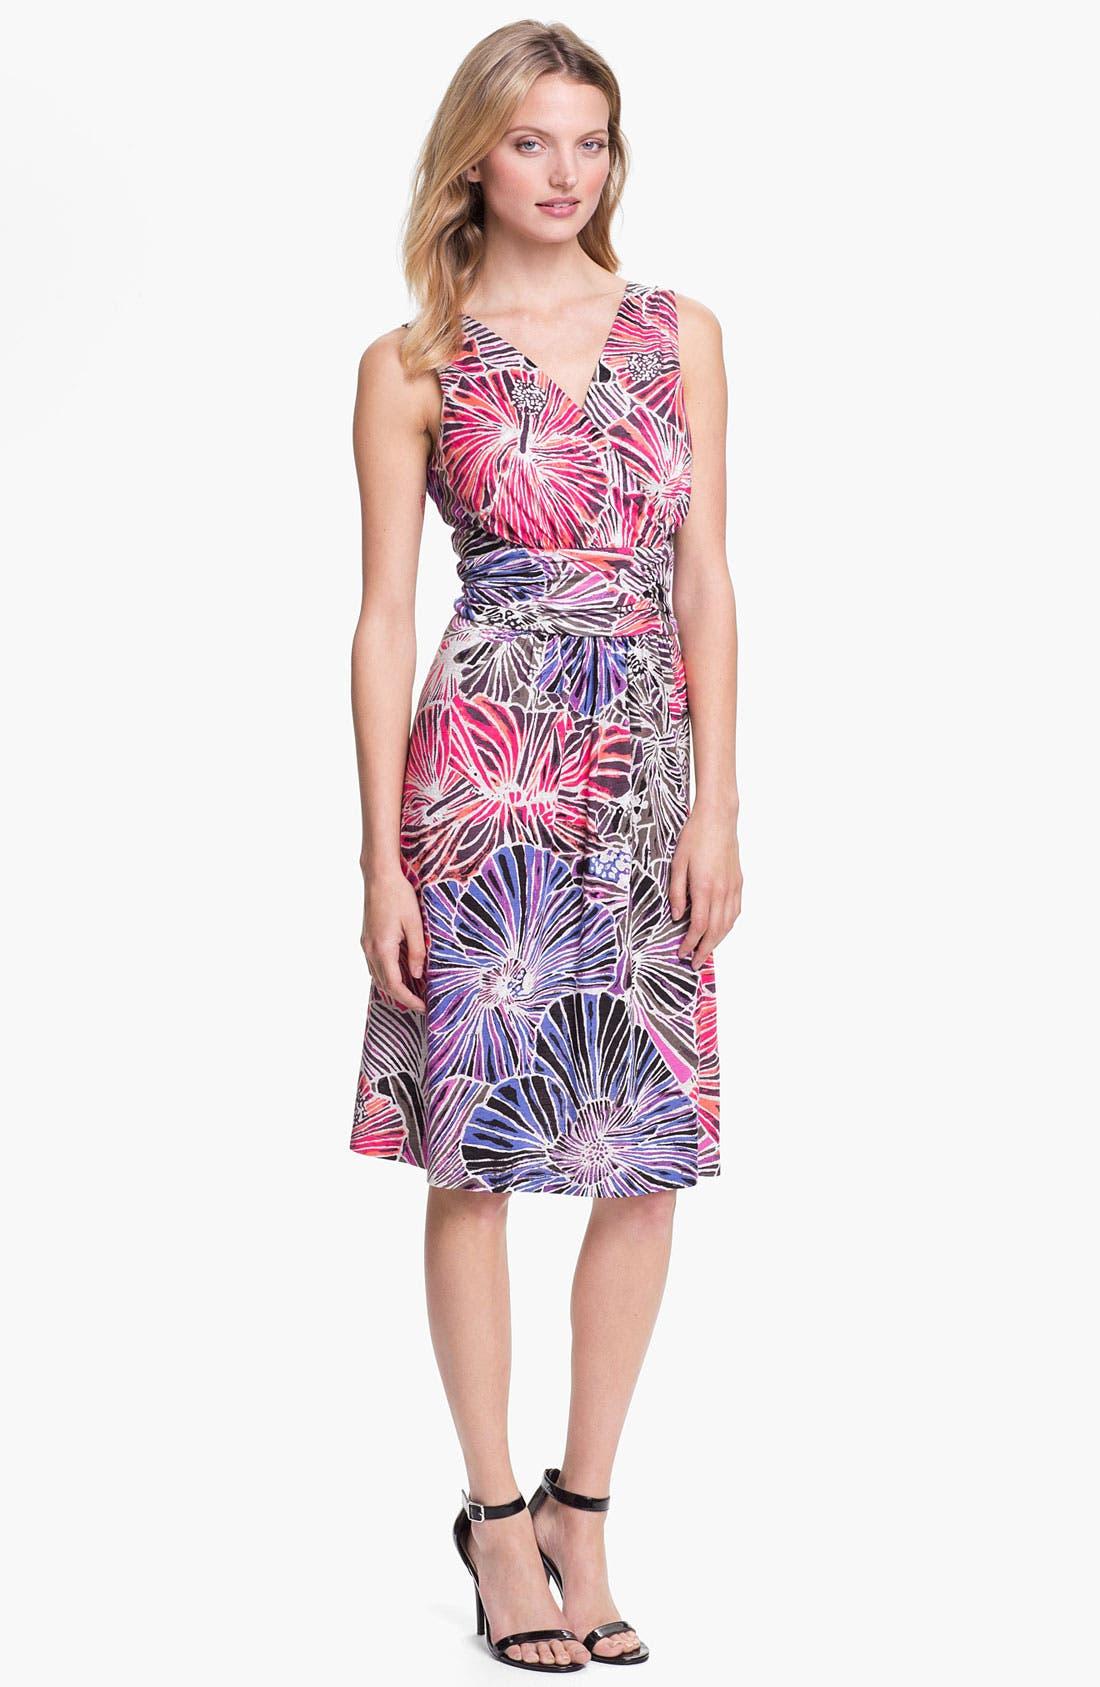 Alternate Image 1 Selected - Nic + Zoe Sleeveless Surplice V-Neck Print Dress